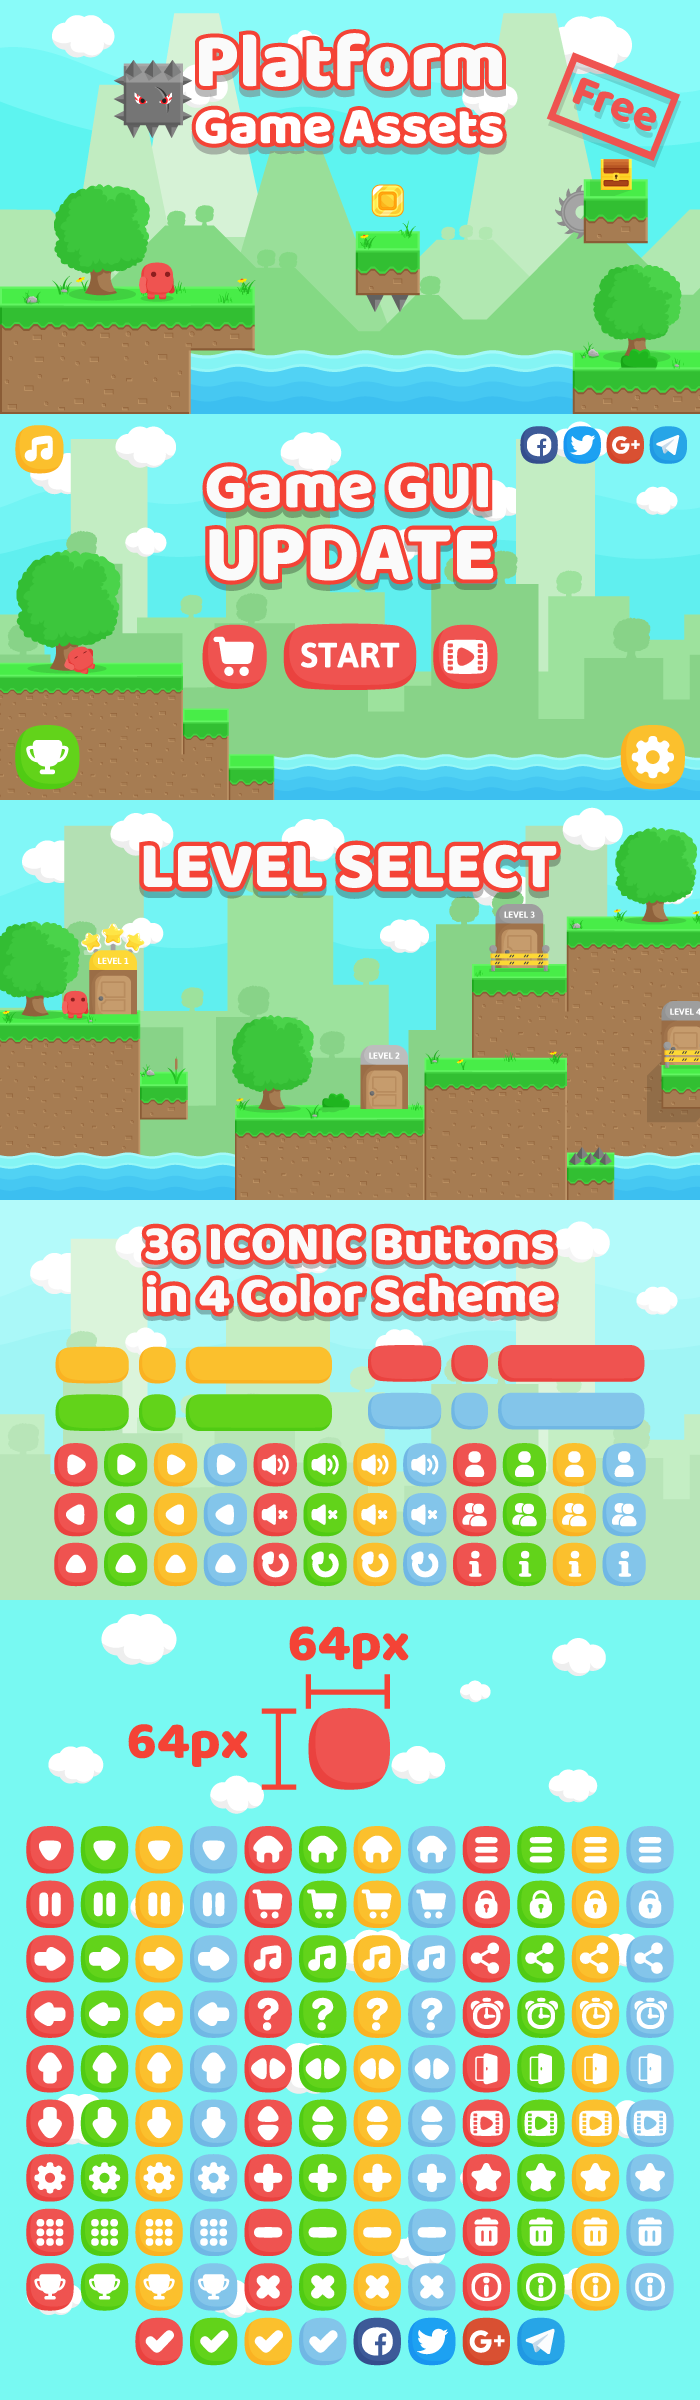 Free Platform Game Assets